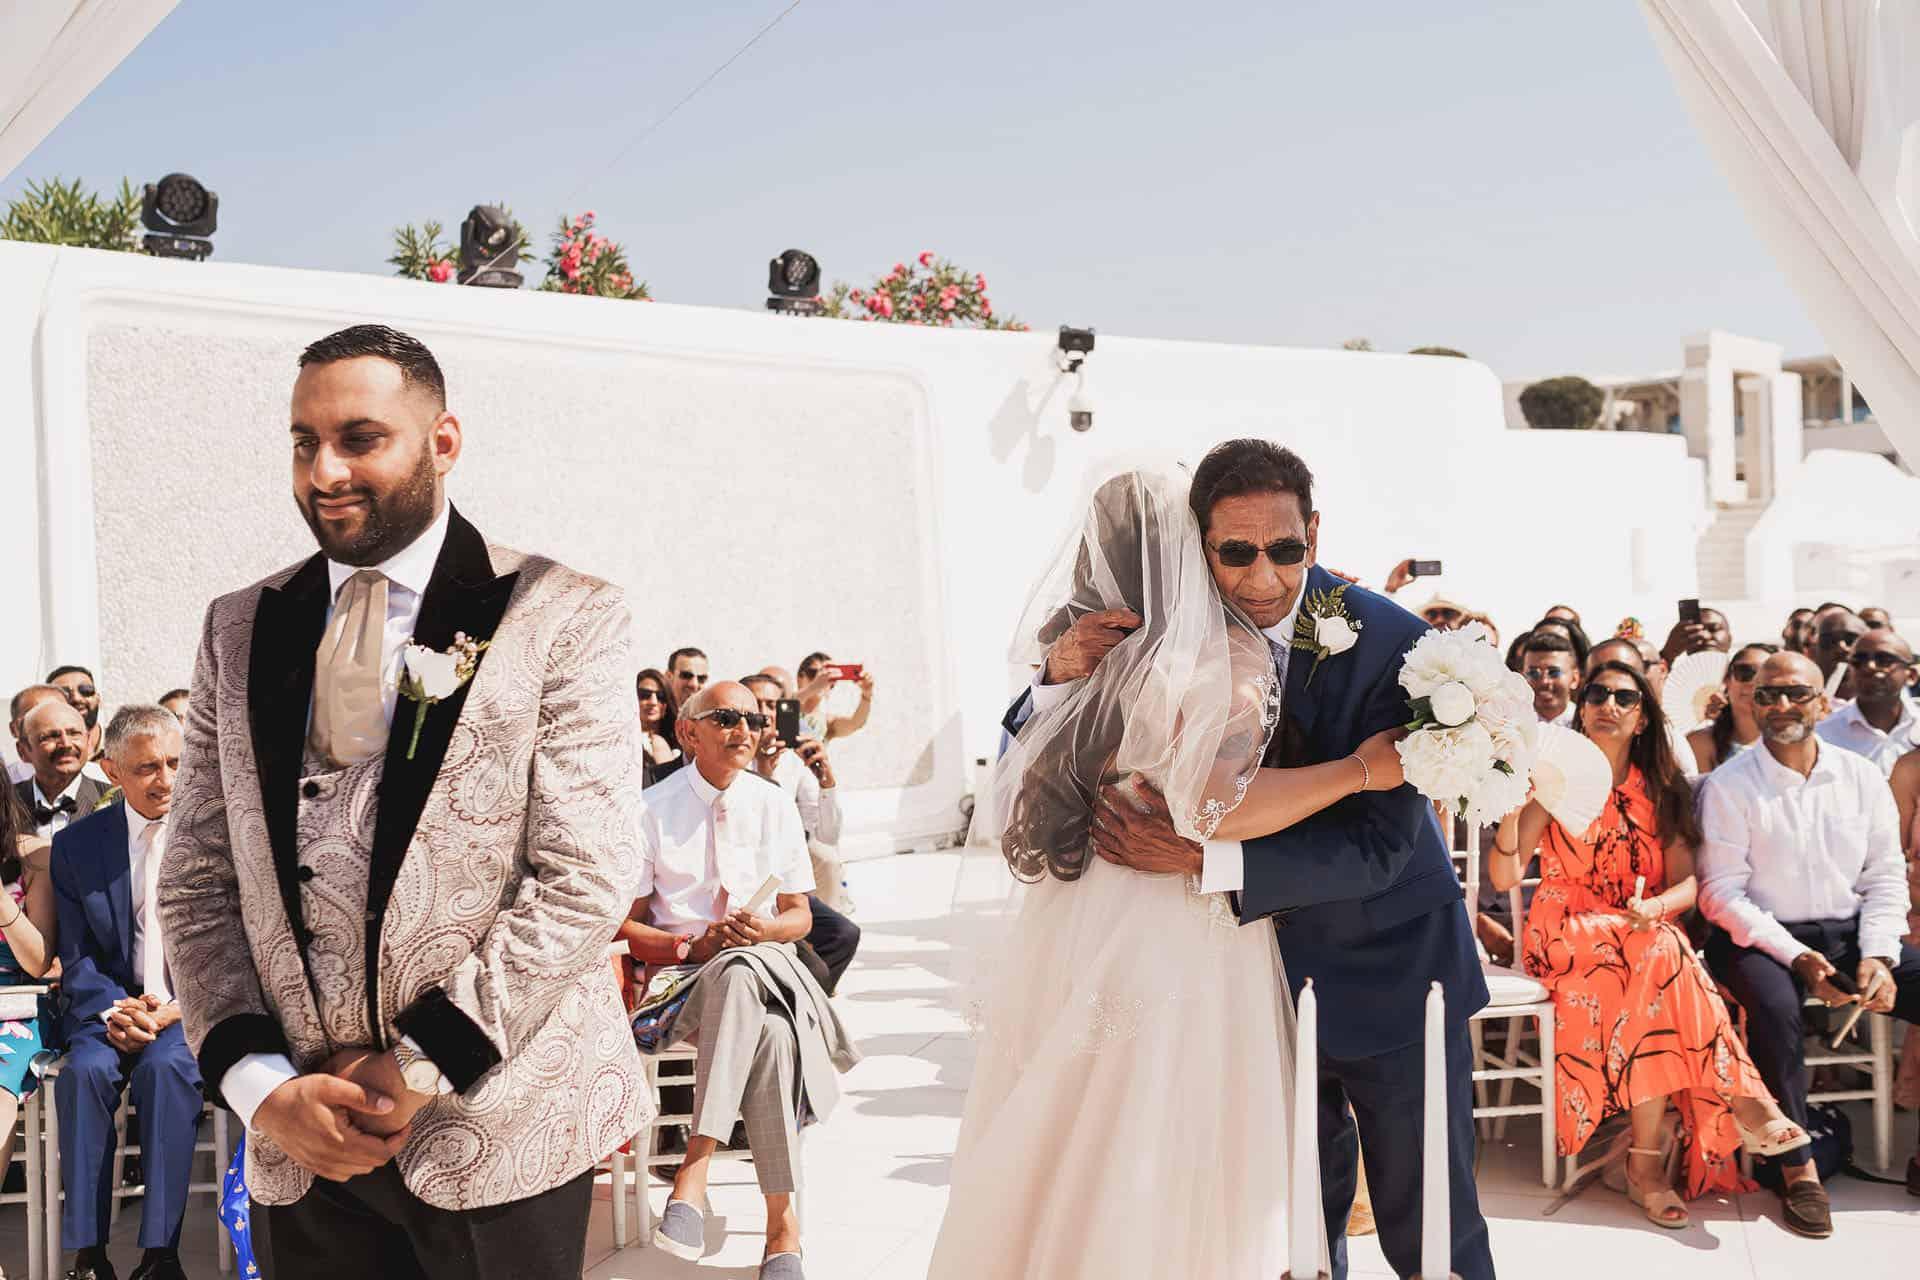 santo winery wedding photographer santorini